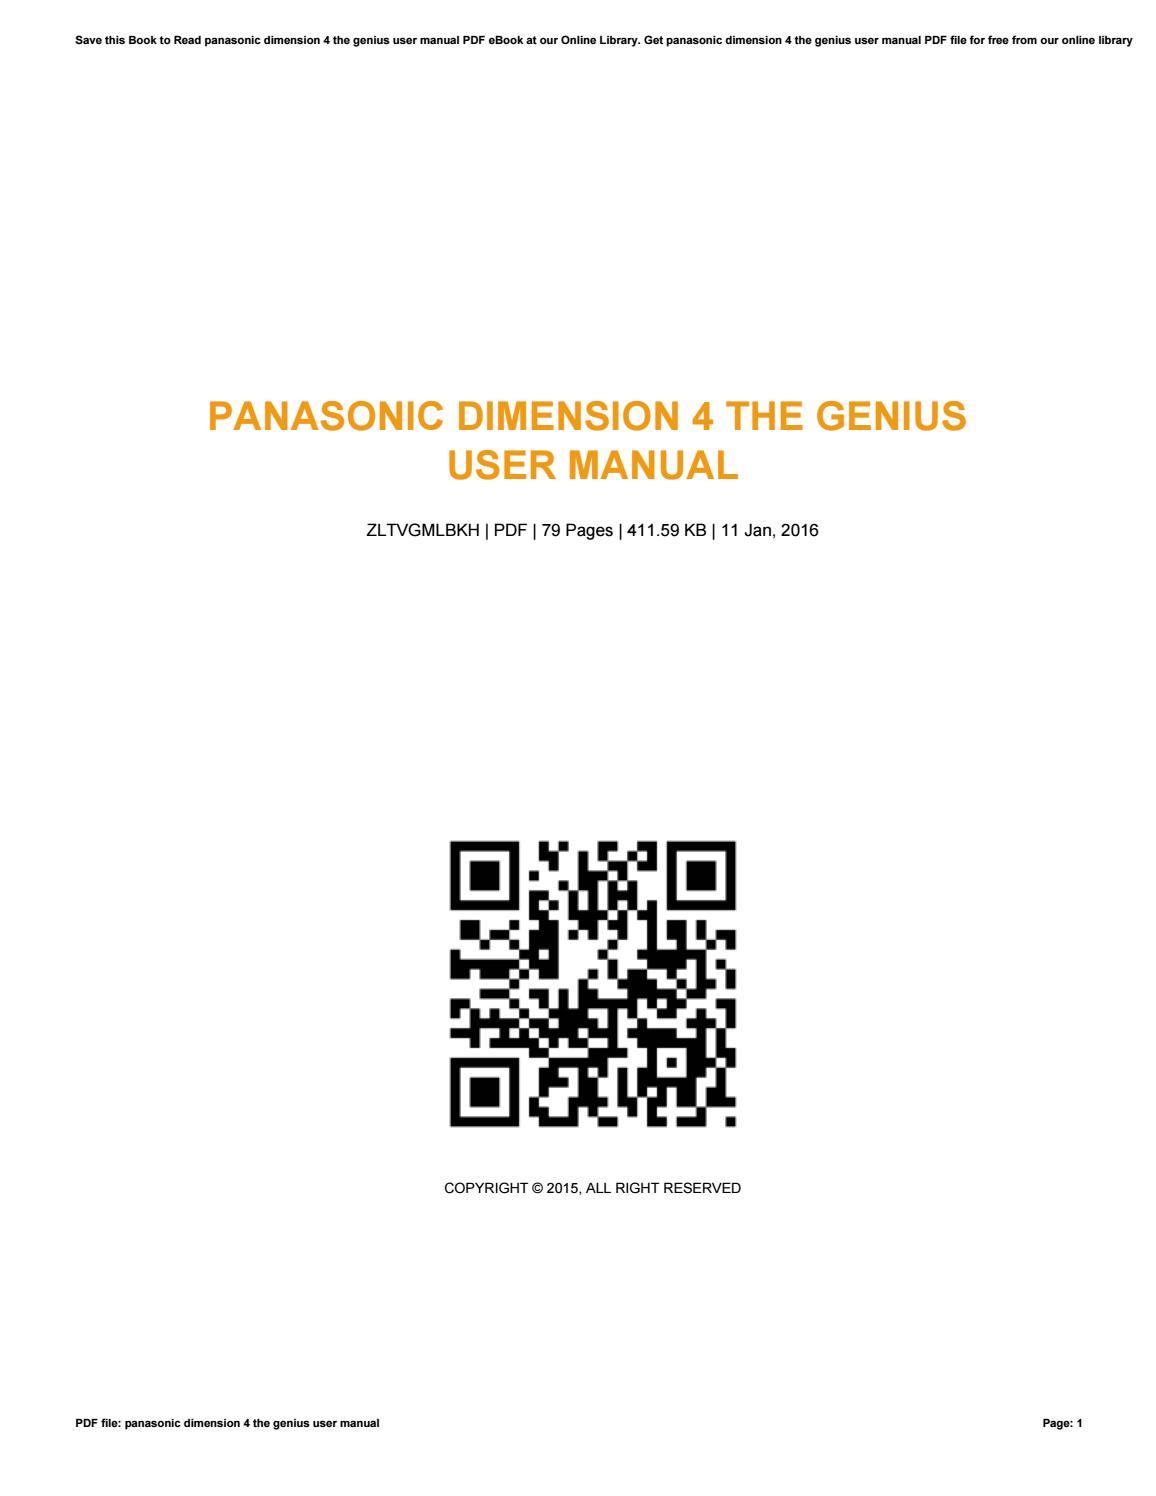 Panasonic dimension 4 the genius user manual by szerz65